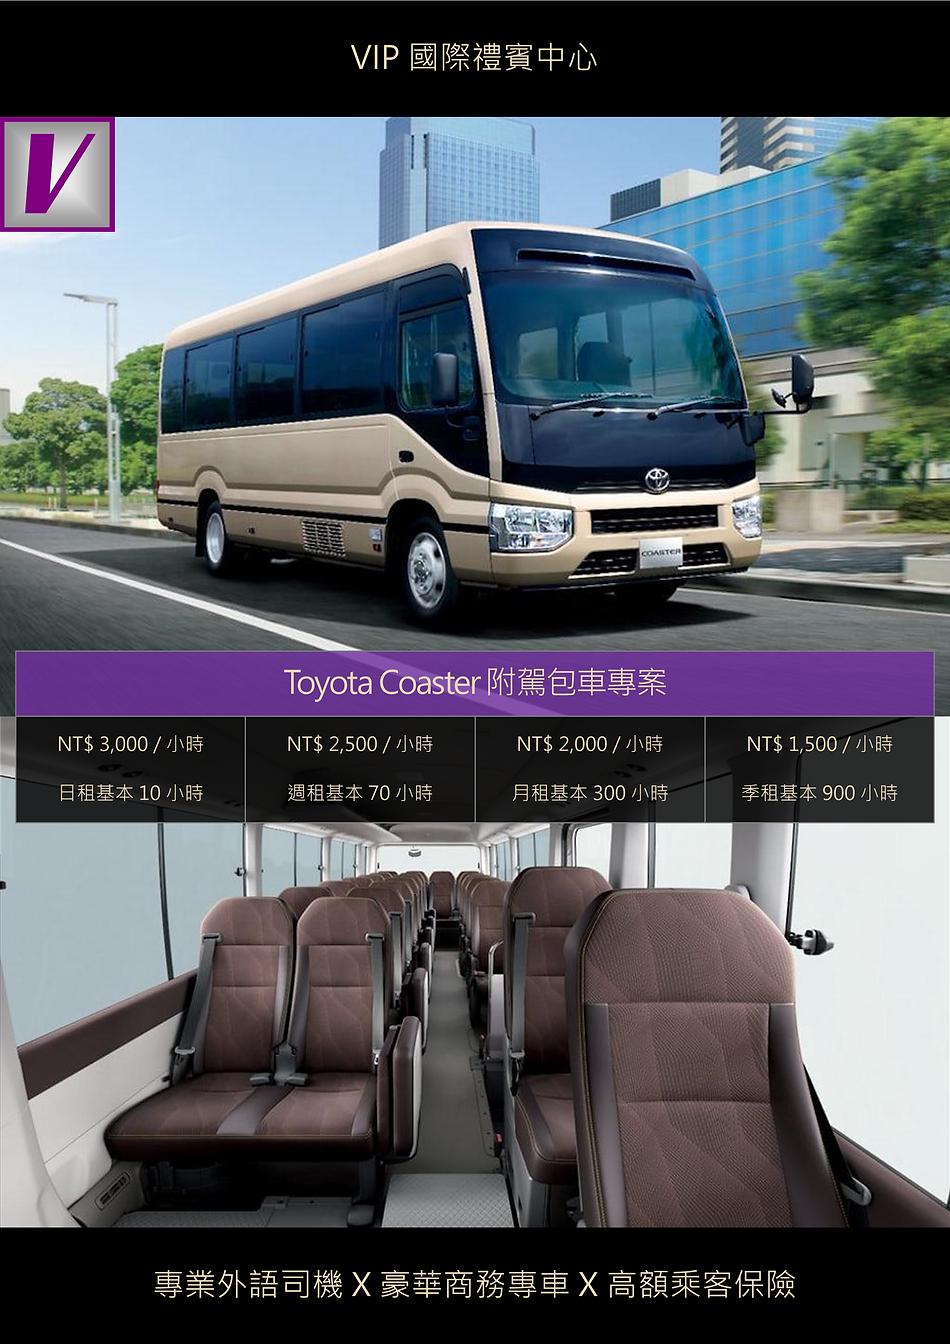 VIP國際禮賓中心 TOYOTA COASTER 附駕包車專案 DM.png